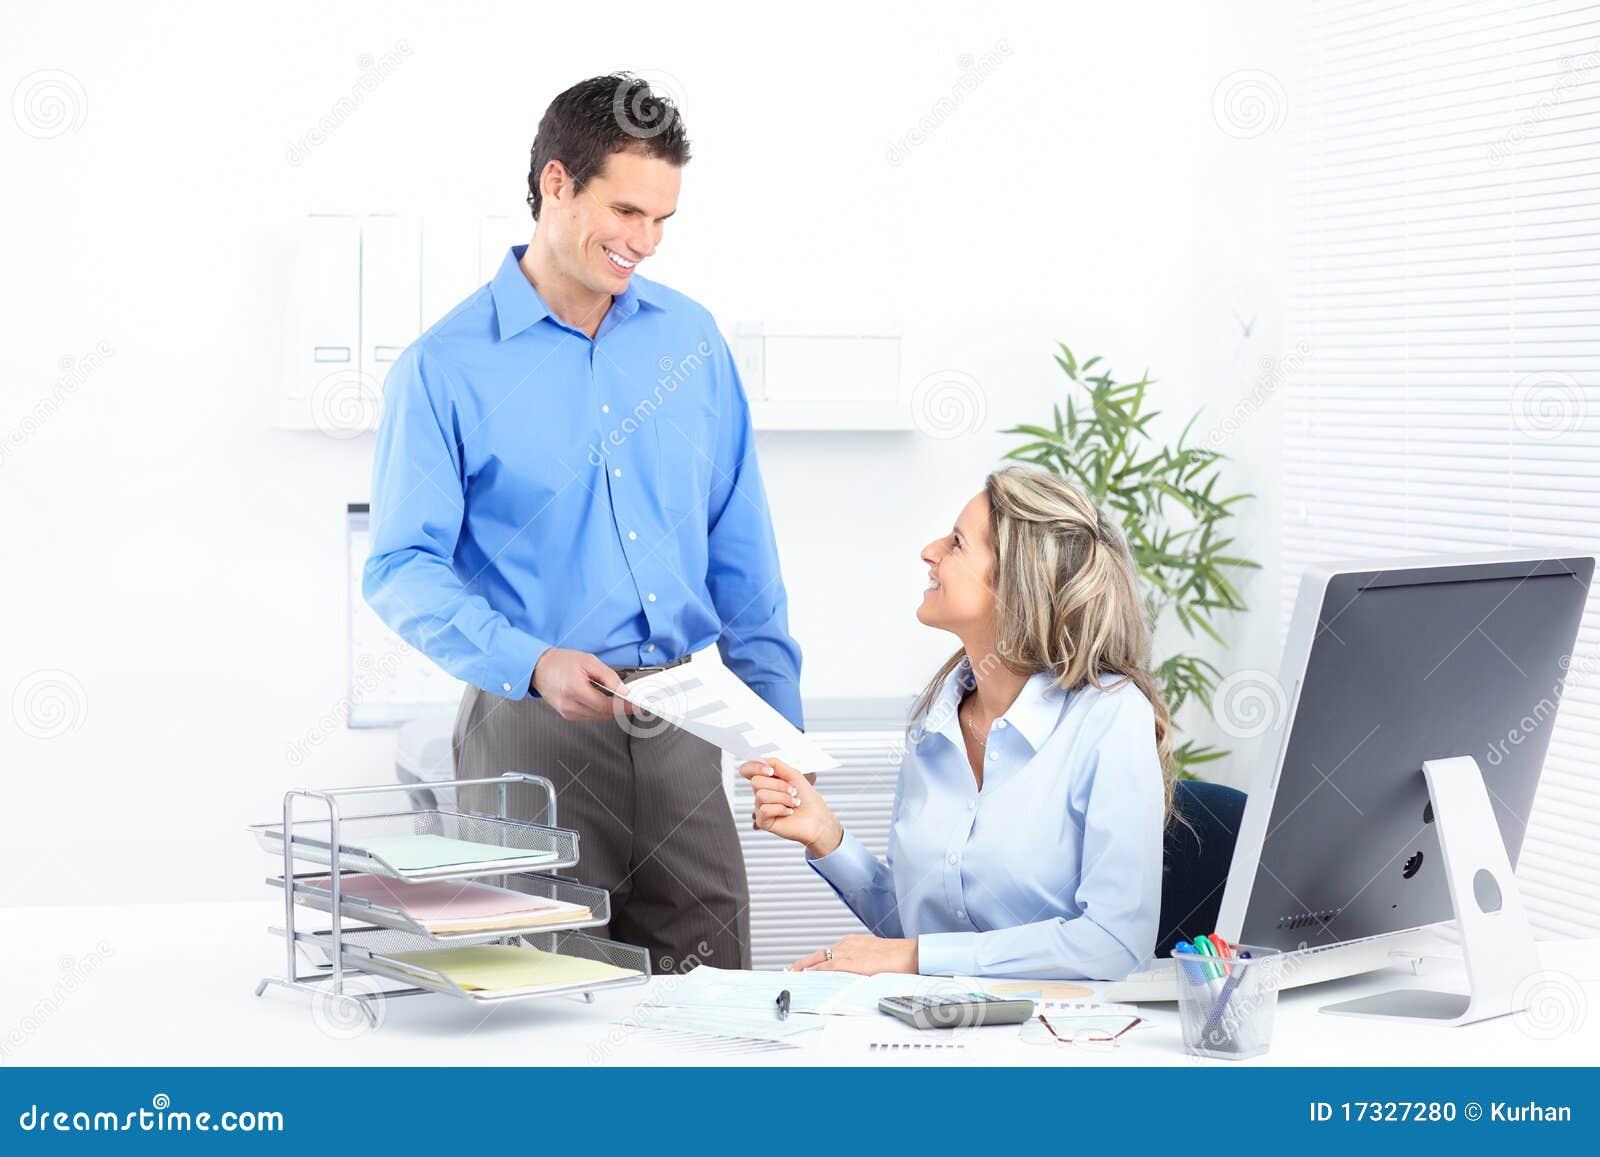 Business People Stock Photo - Image: 17327280